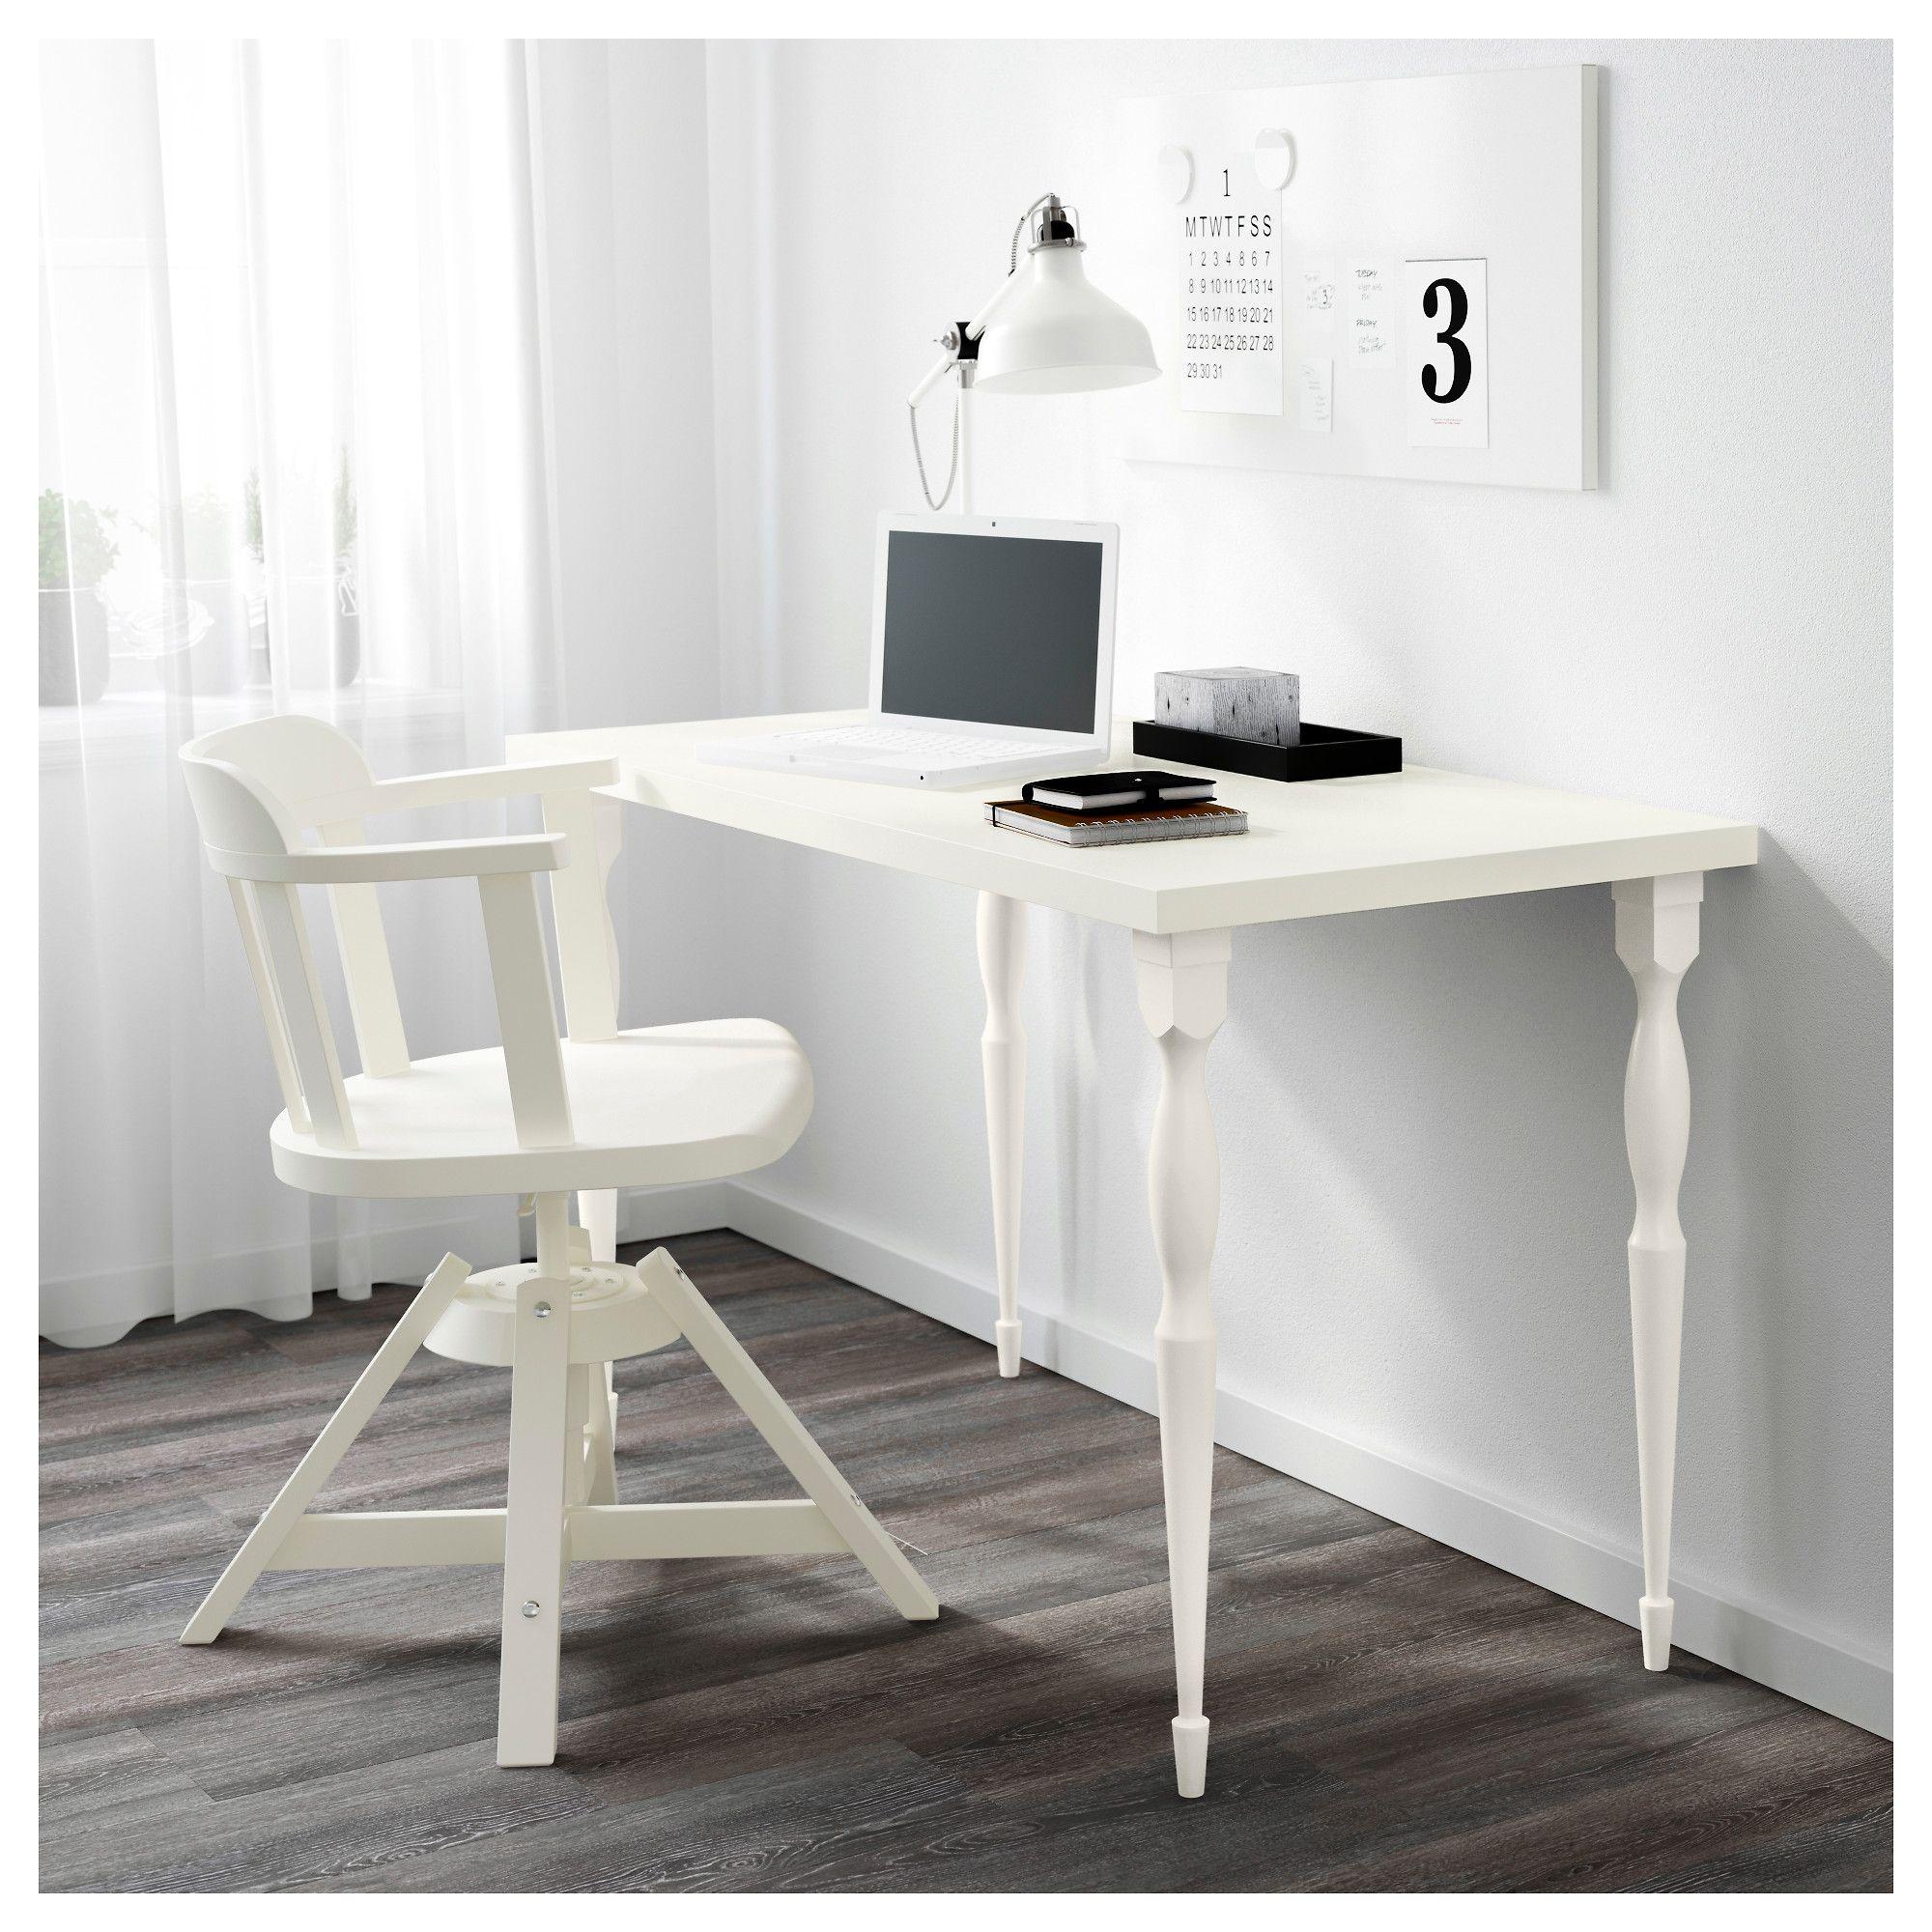 Ikea Linnmon Table Top White